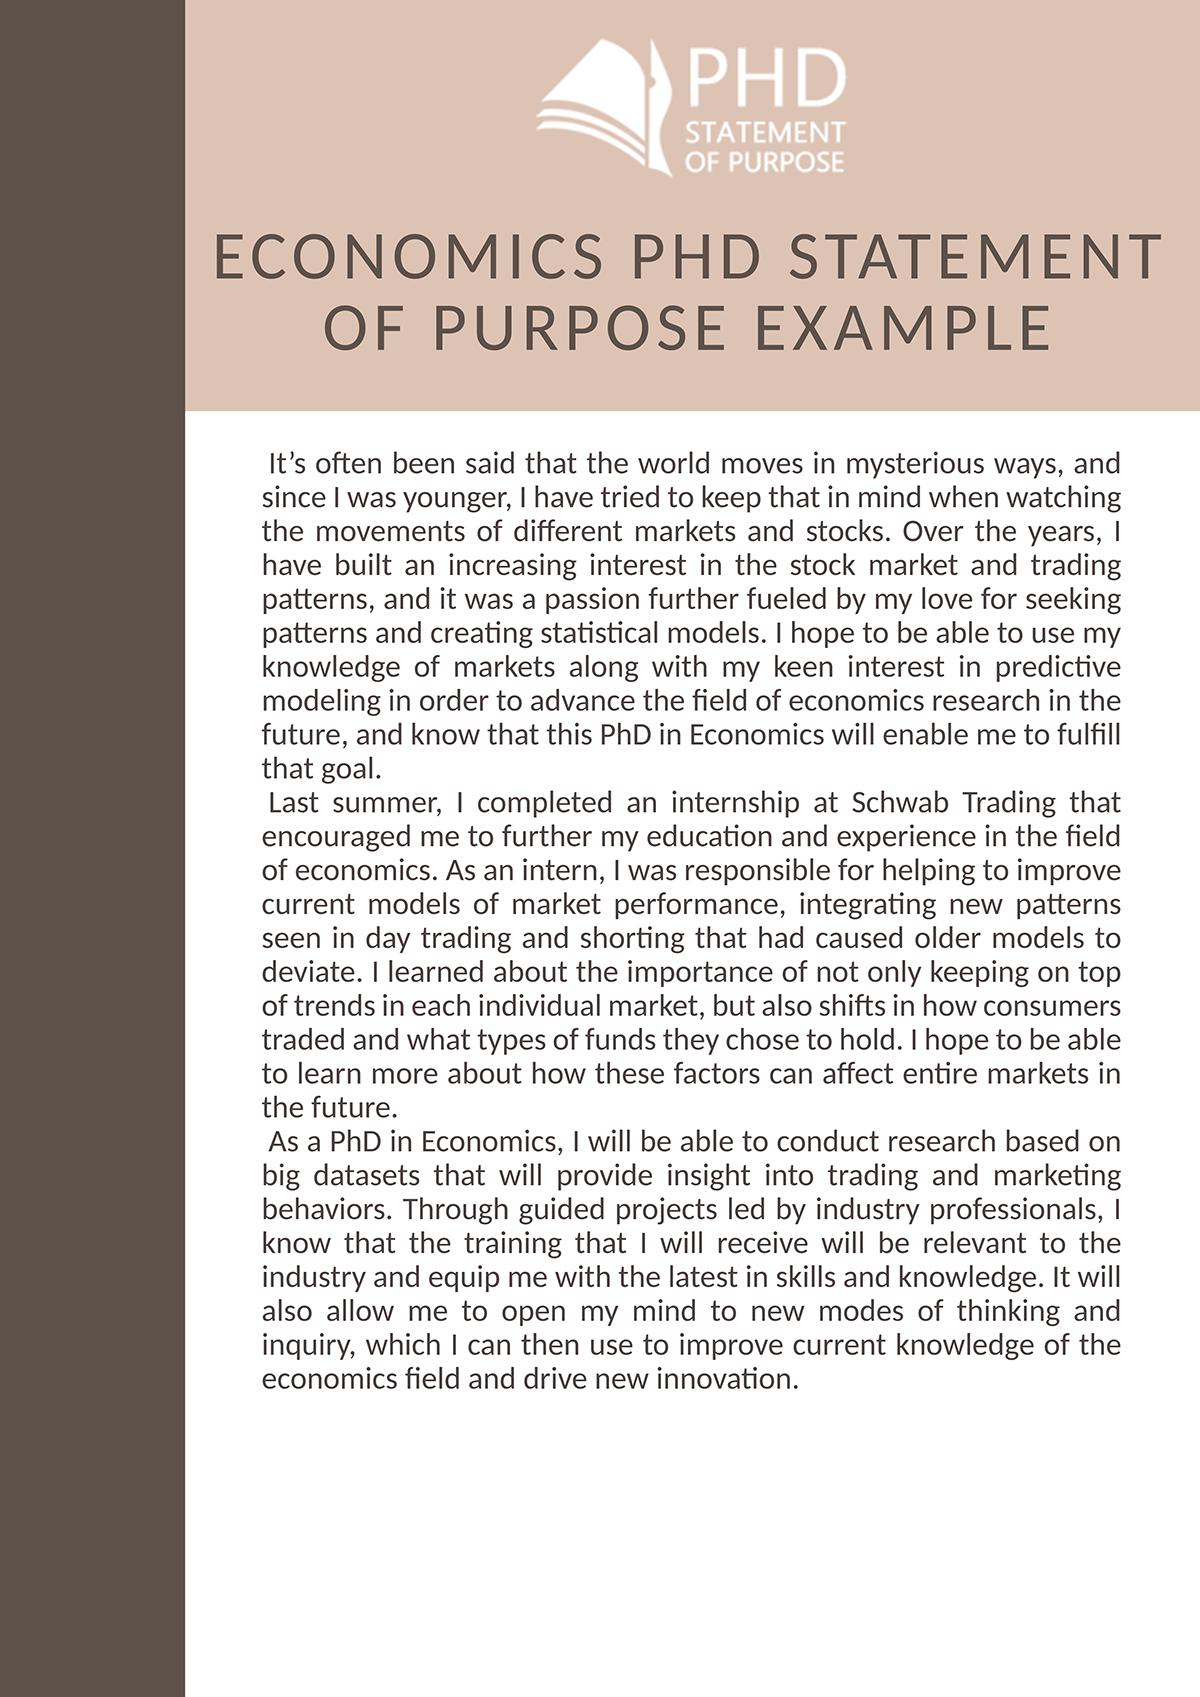 Phd statement of purpose